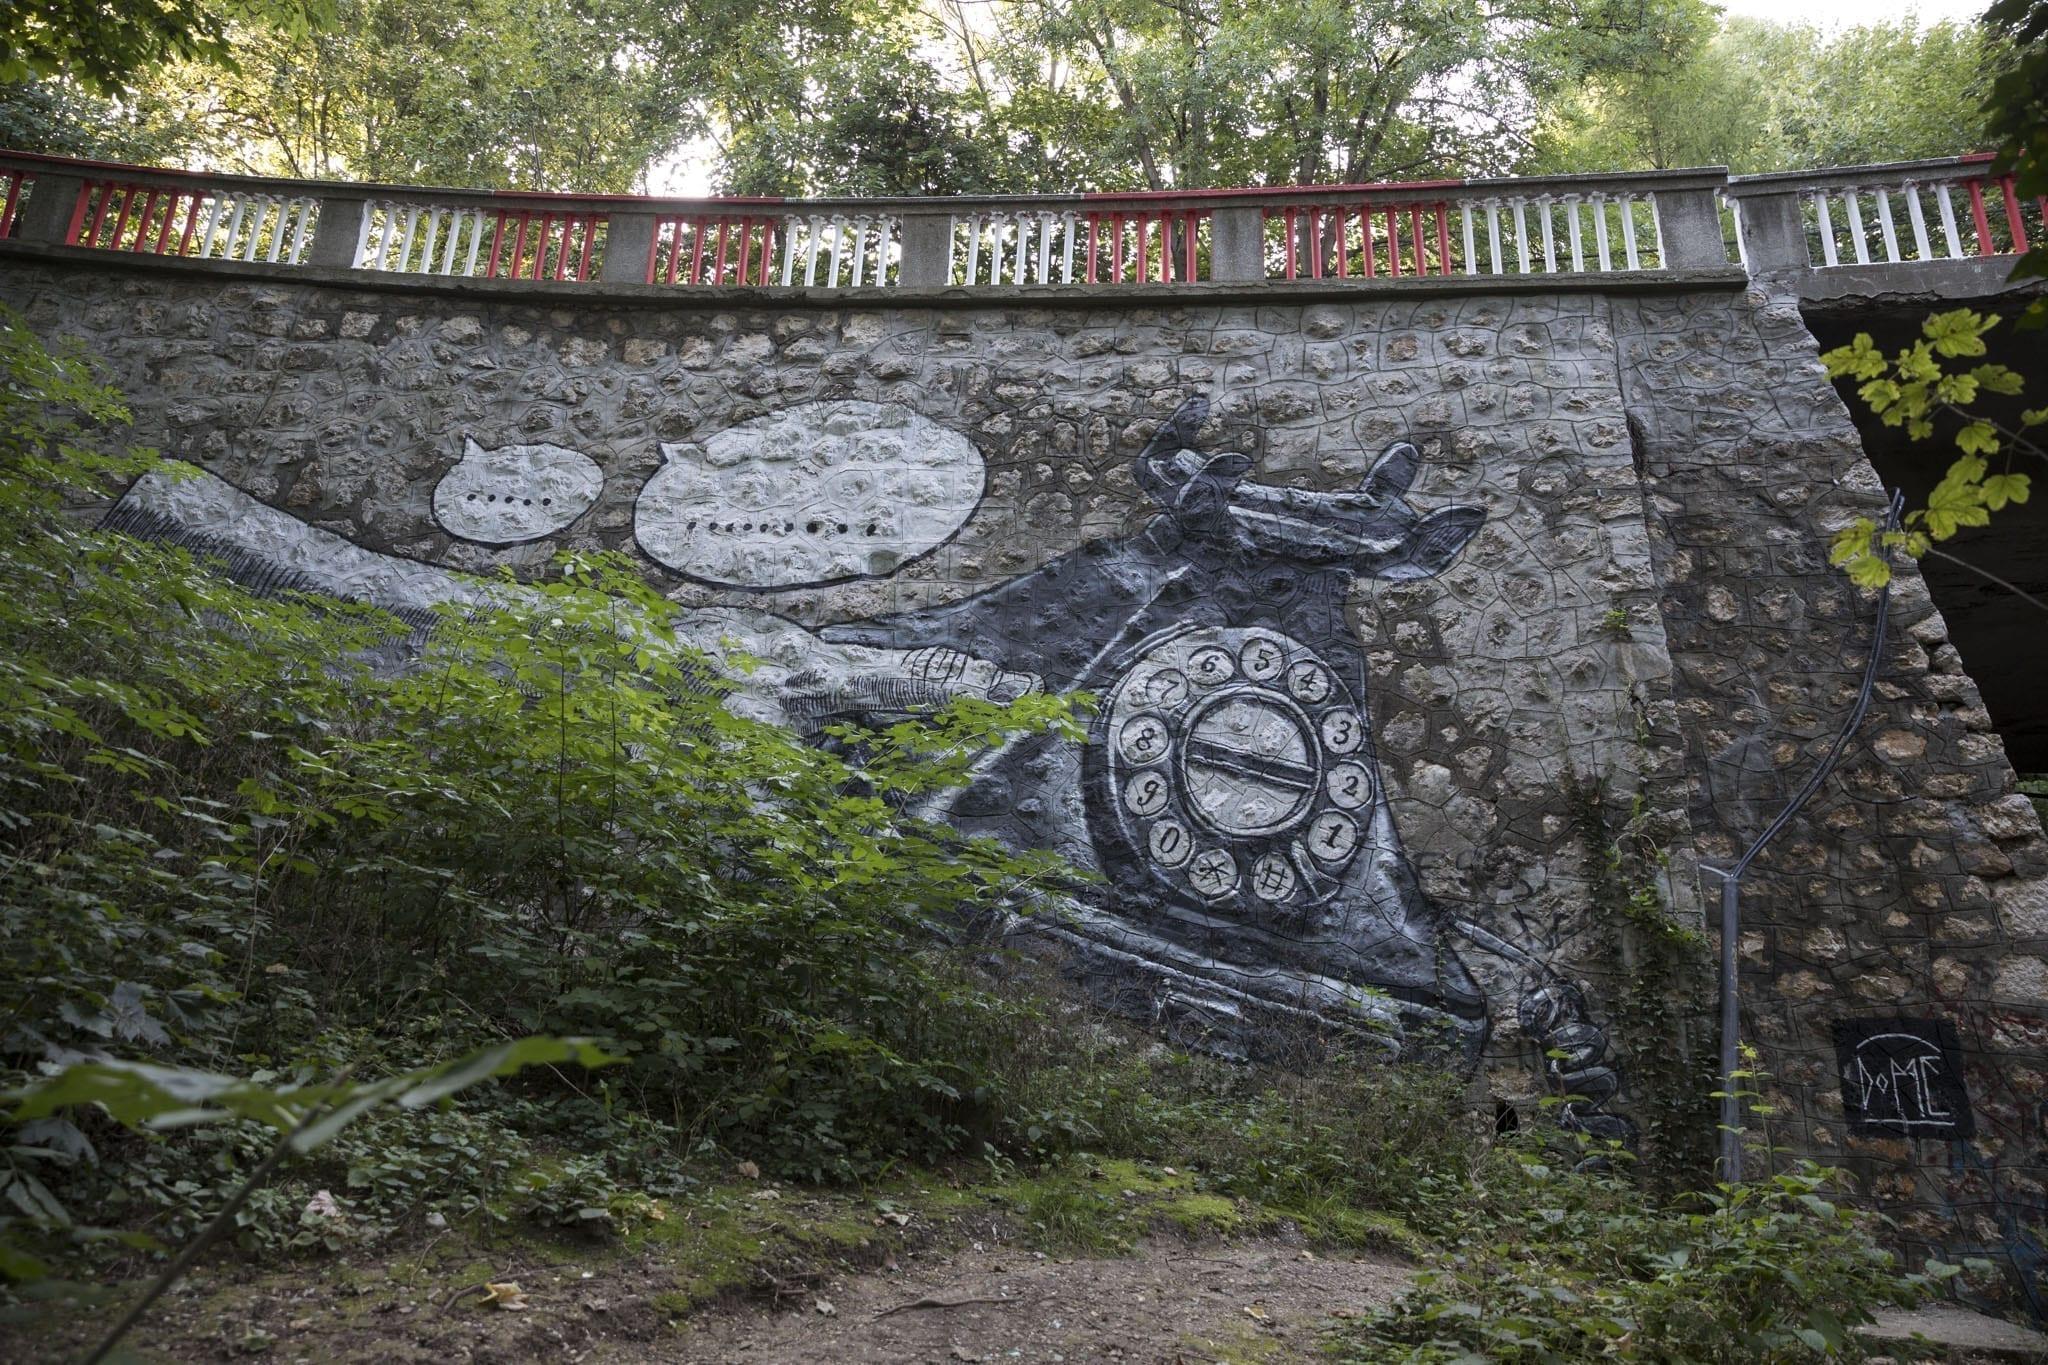 DOME (Germany) / Amural 3 Festival Vizual / 2017 Brasov Un-hidden street art in Romania